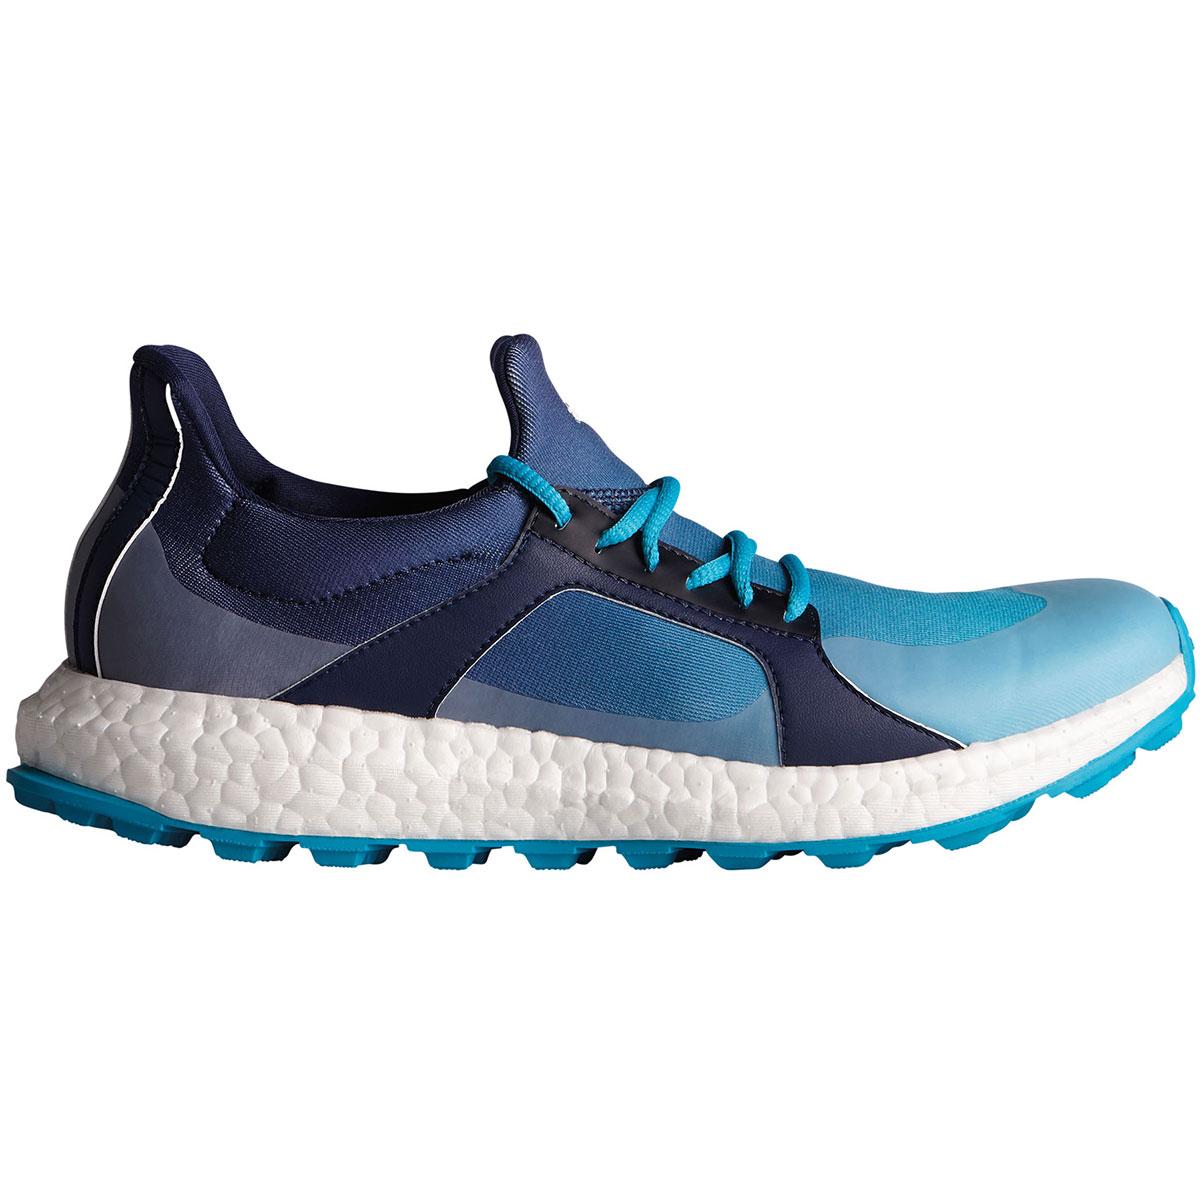 Adidas Ladies Golf Shoes Uk